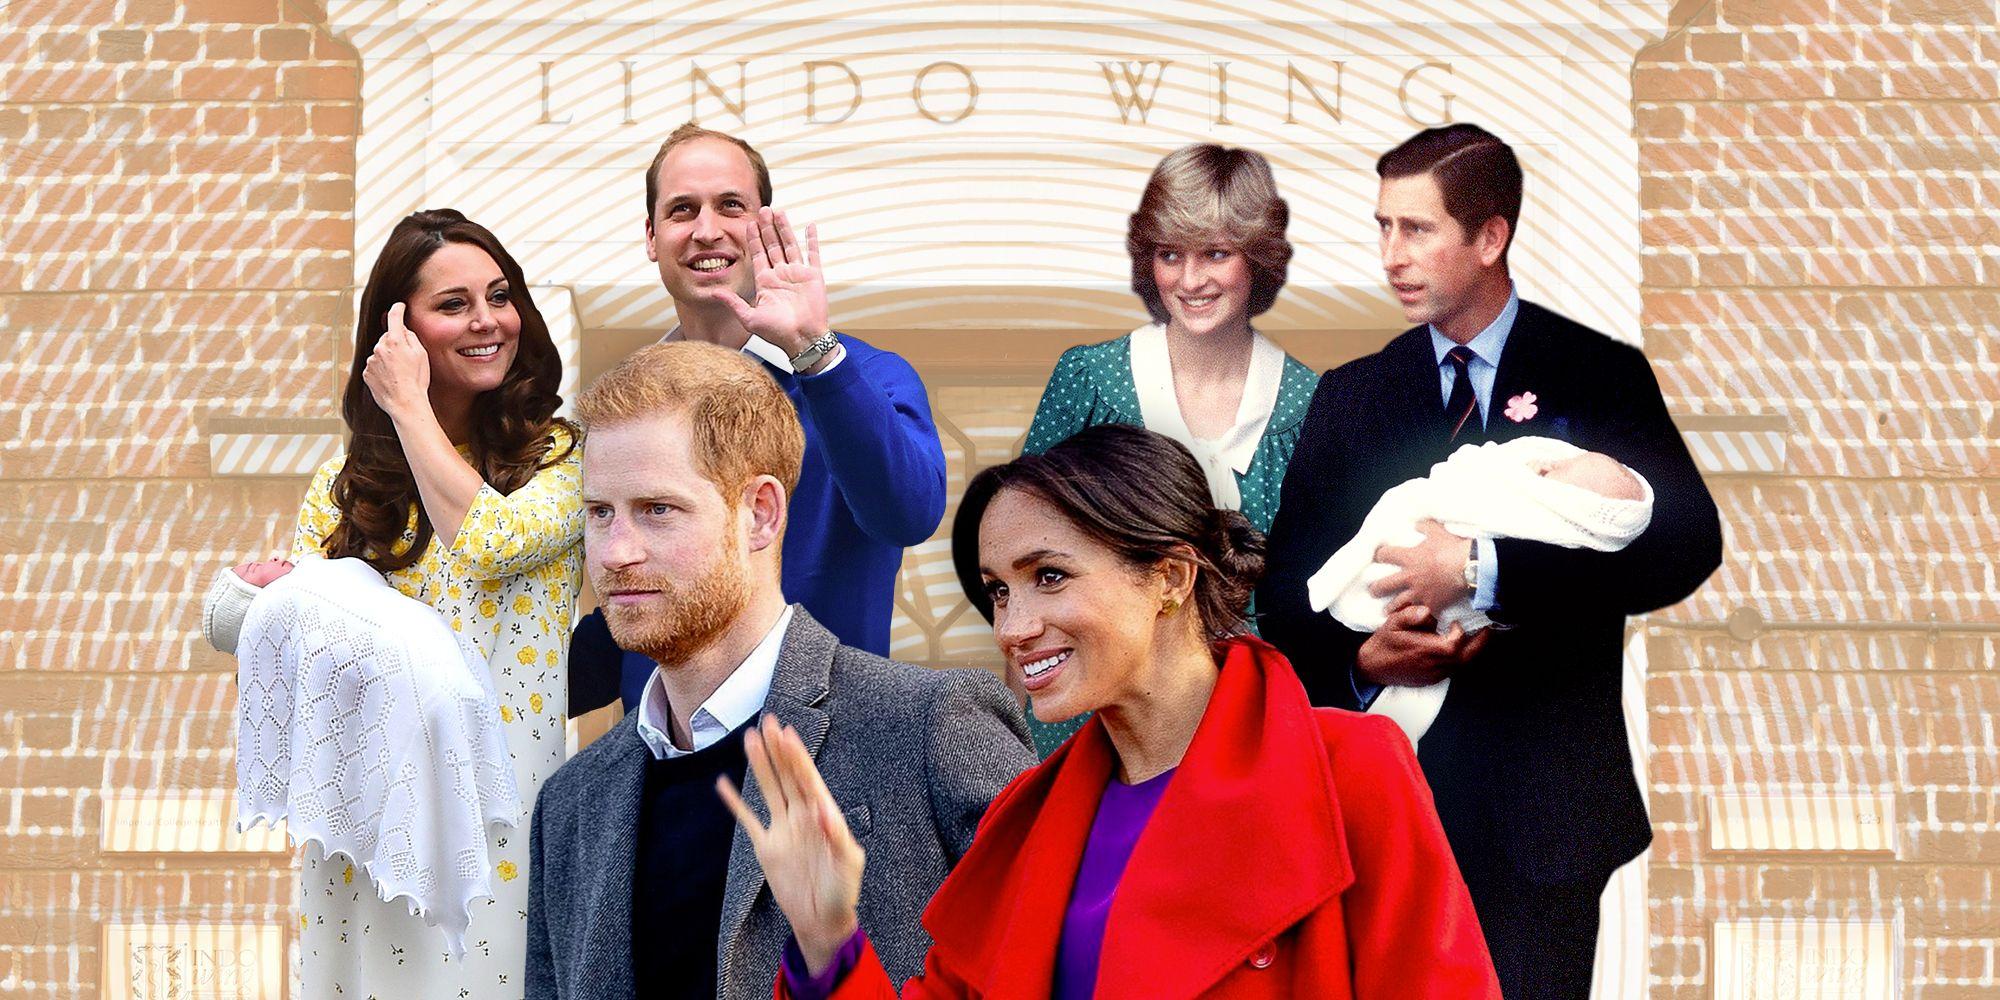 Prince Harry Meghan Markle Royal Baby Photo